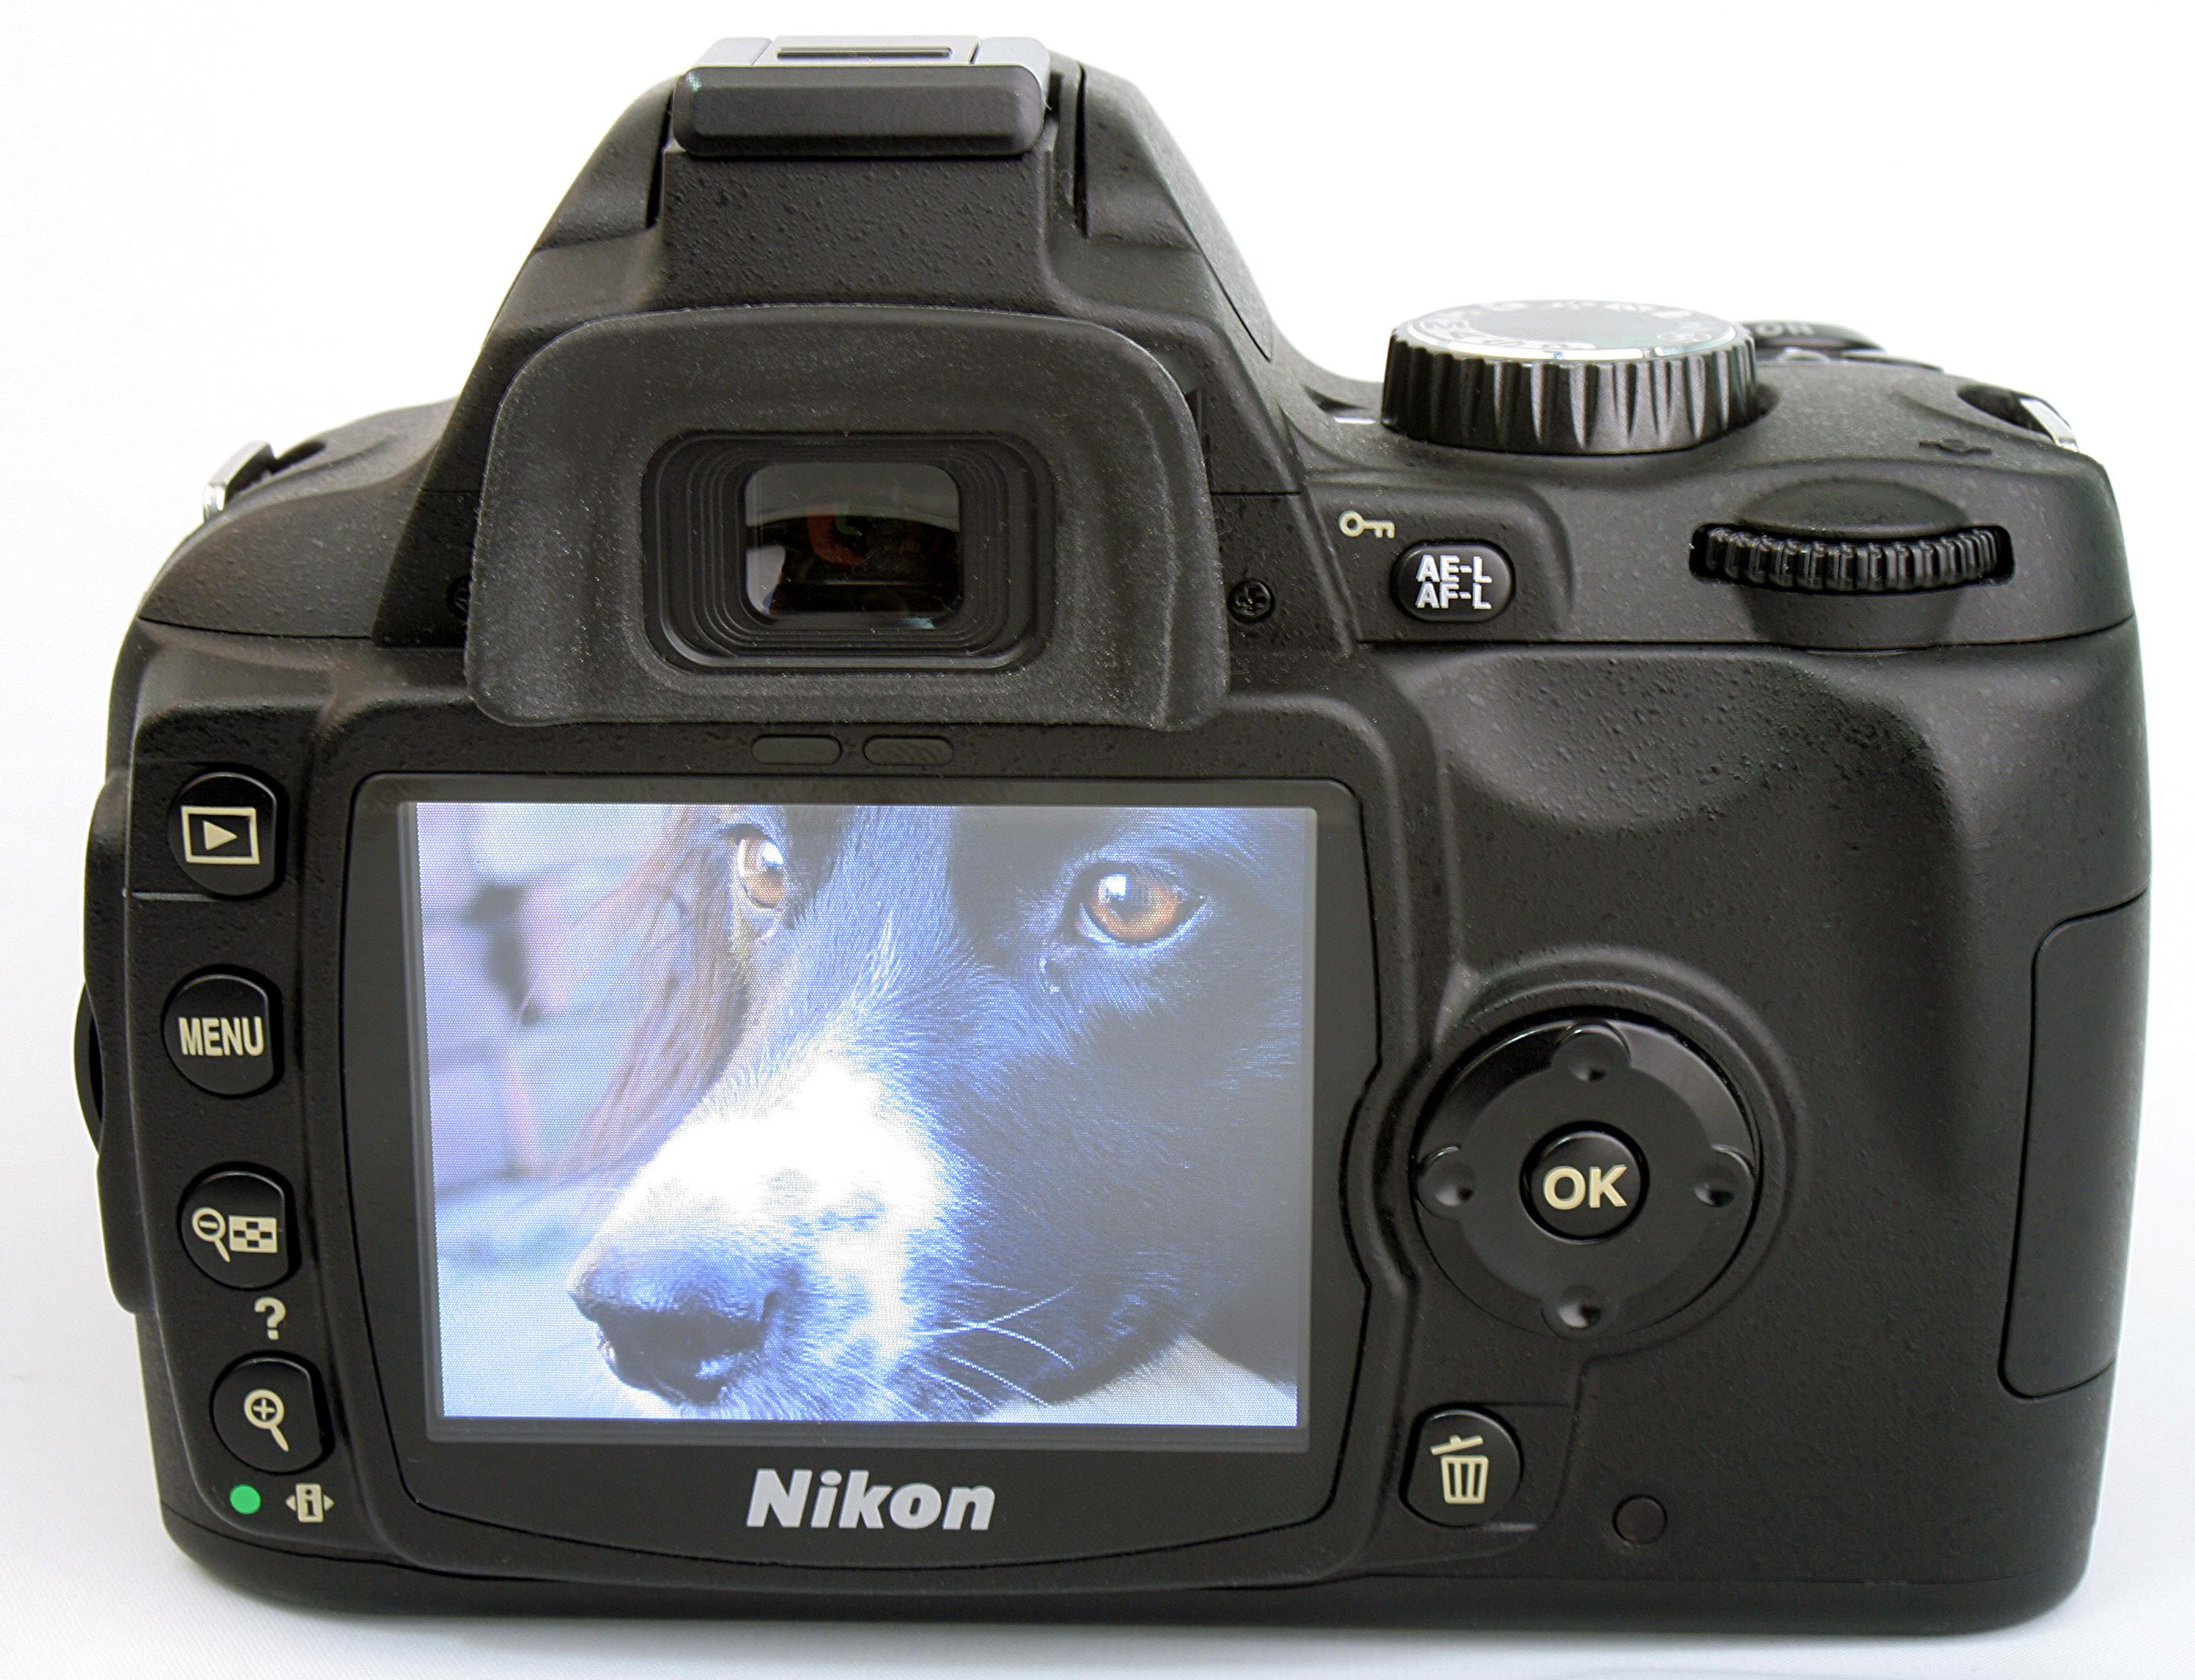 Nikon D60 Digital SLR Review